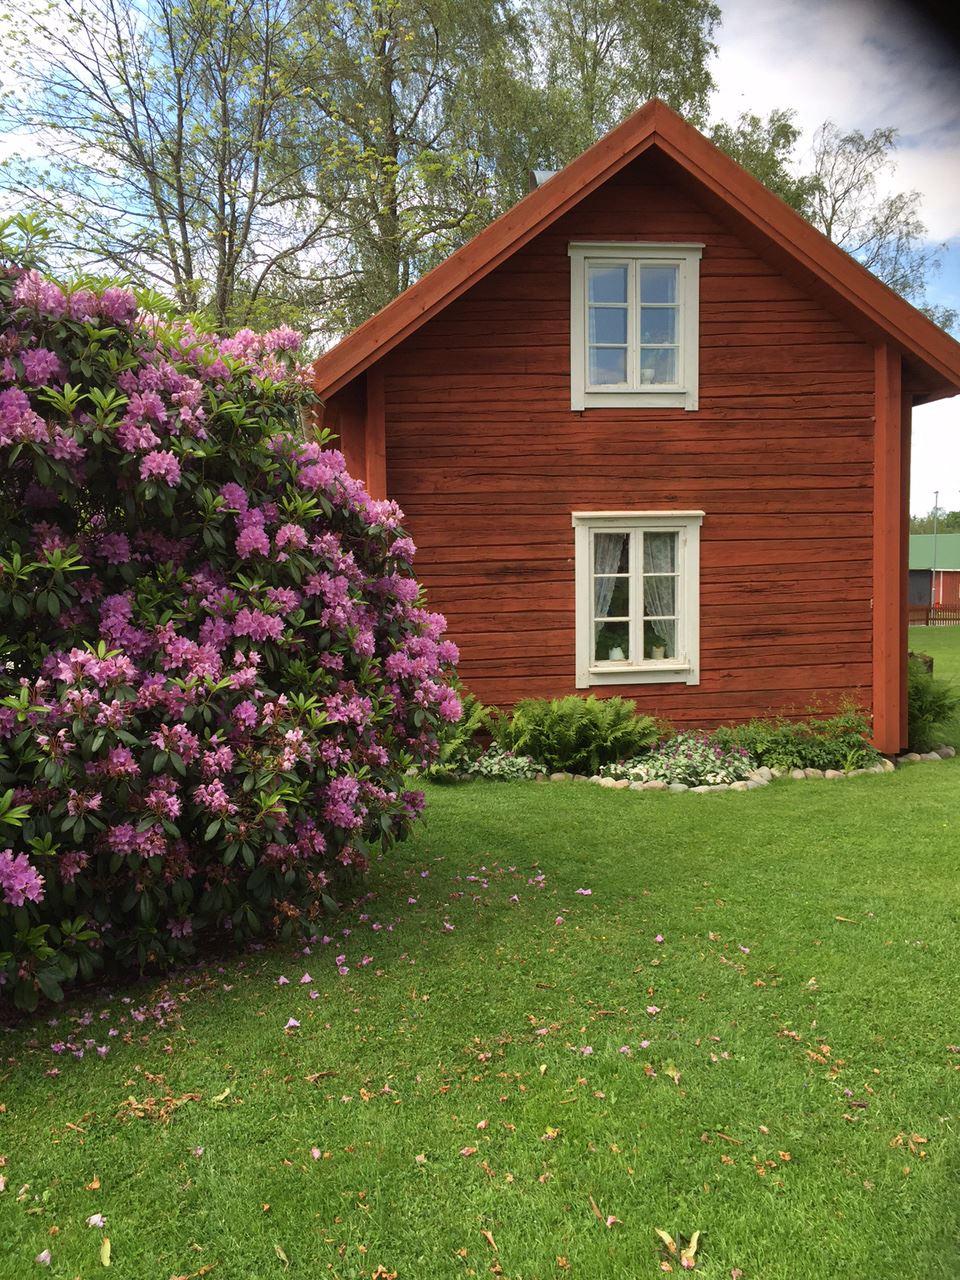 © Vetlanda turistcenter, Erikshester gård